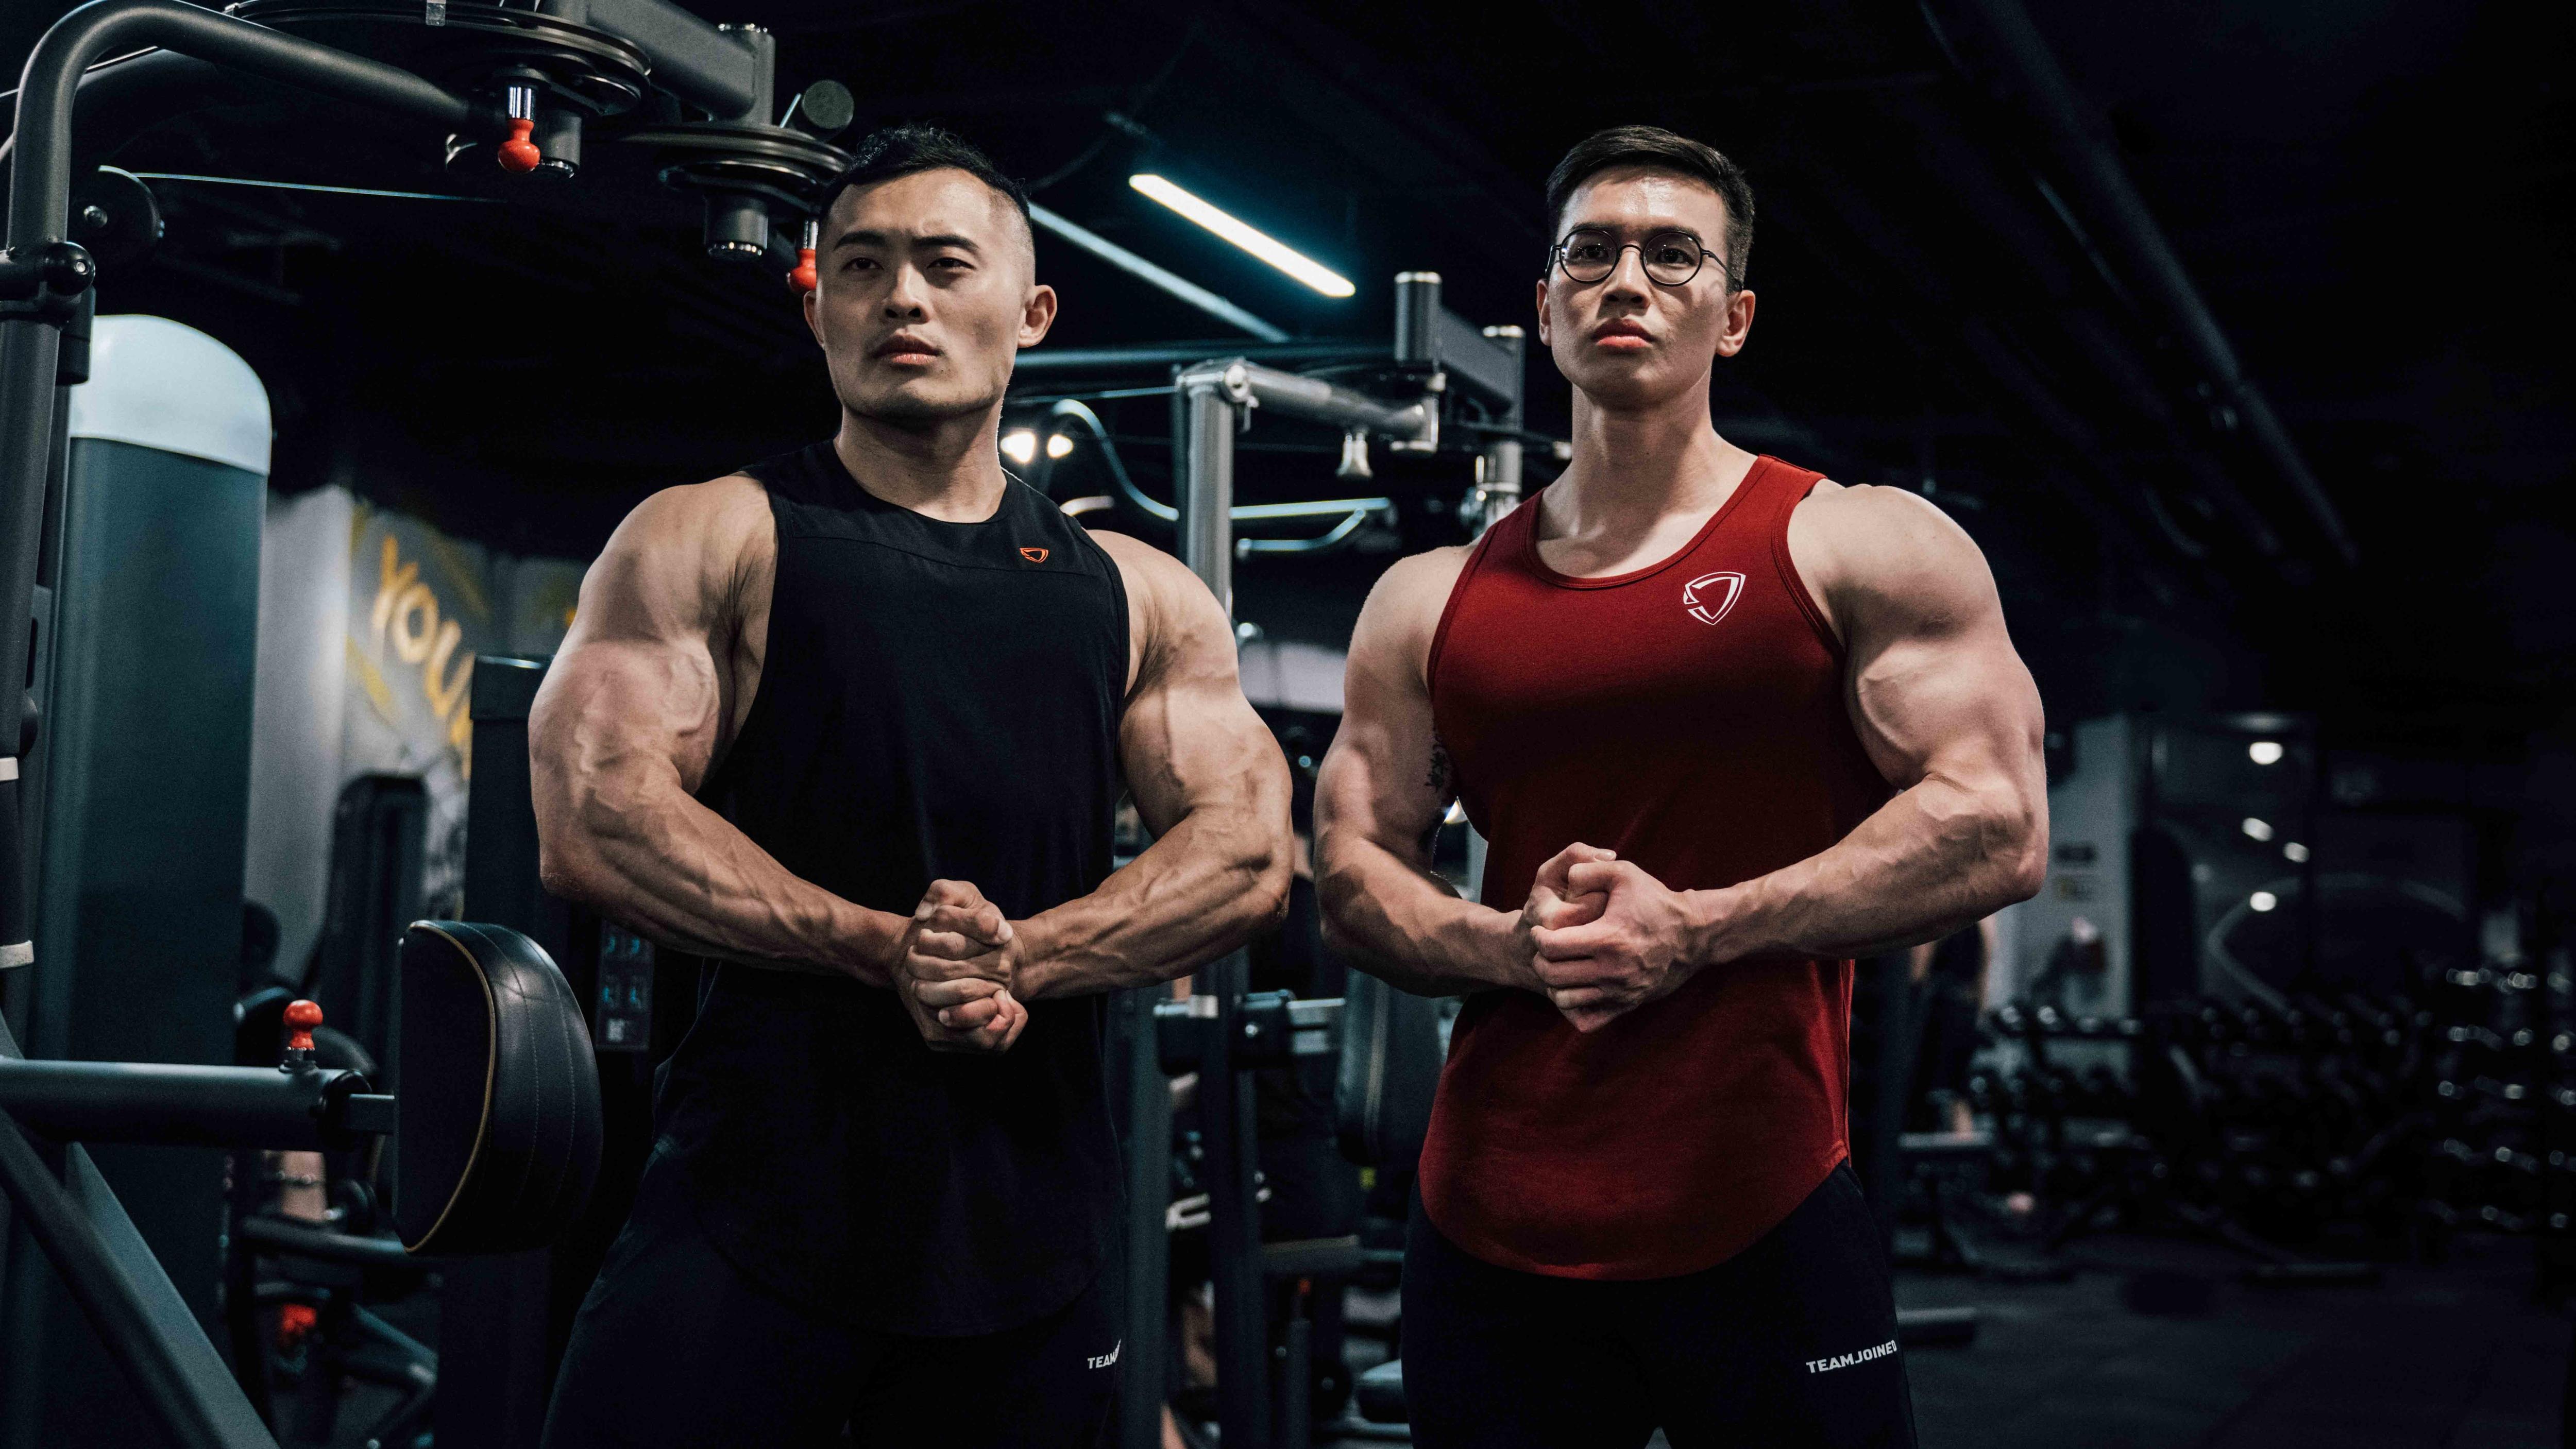 IFBB PRO大H跟超級熱狗王穿著TEAMJOINED訓練背心在健身房裡擠壓肌肉